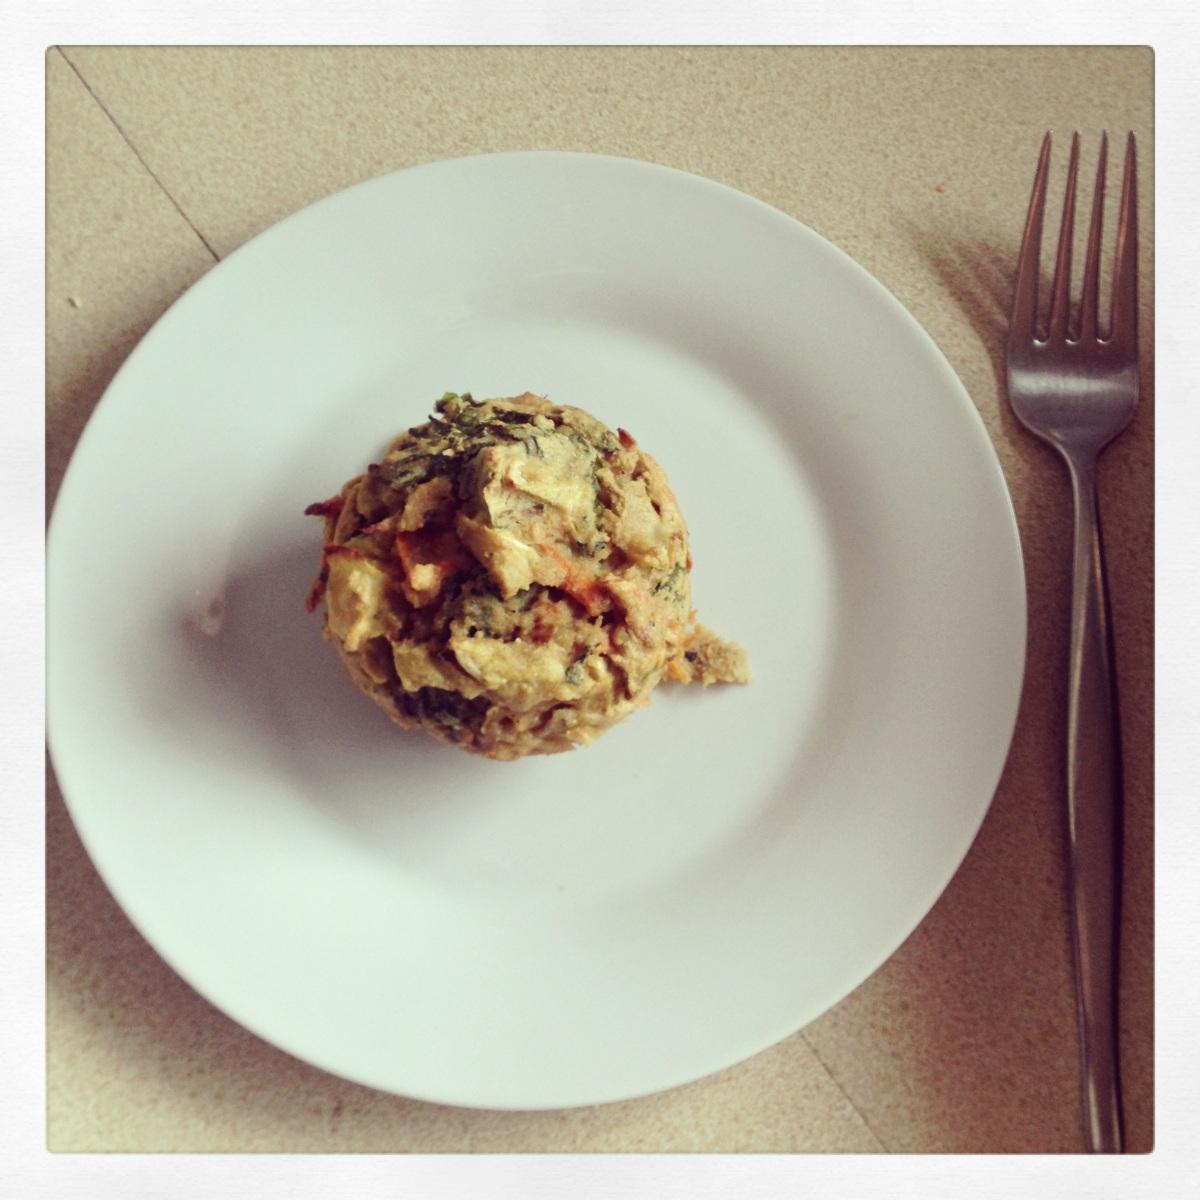 Kale, Zucchini and Carrot Savoury Muffins.